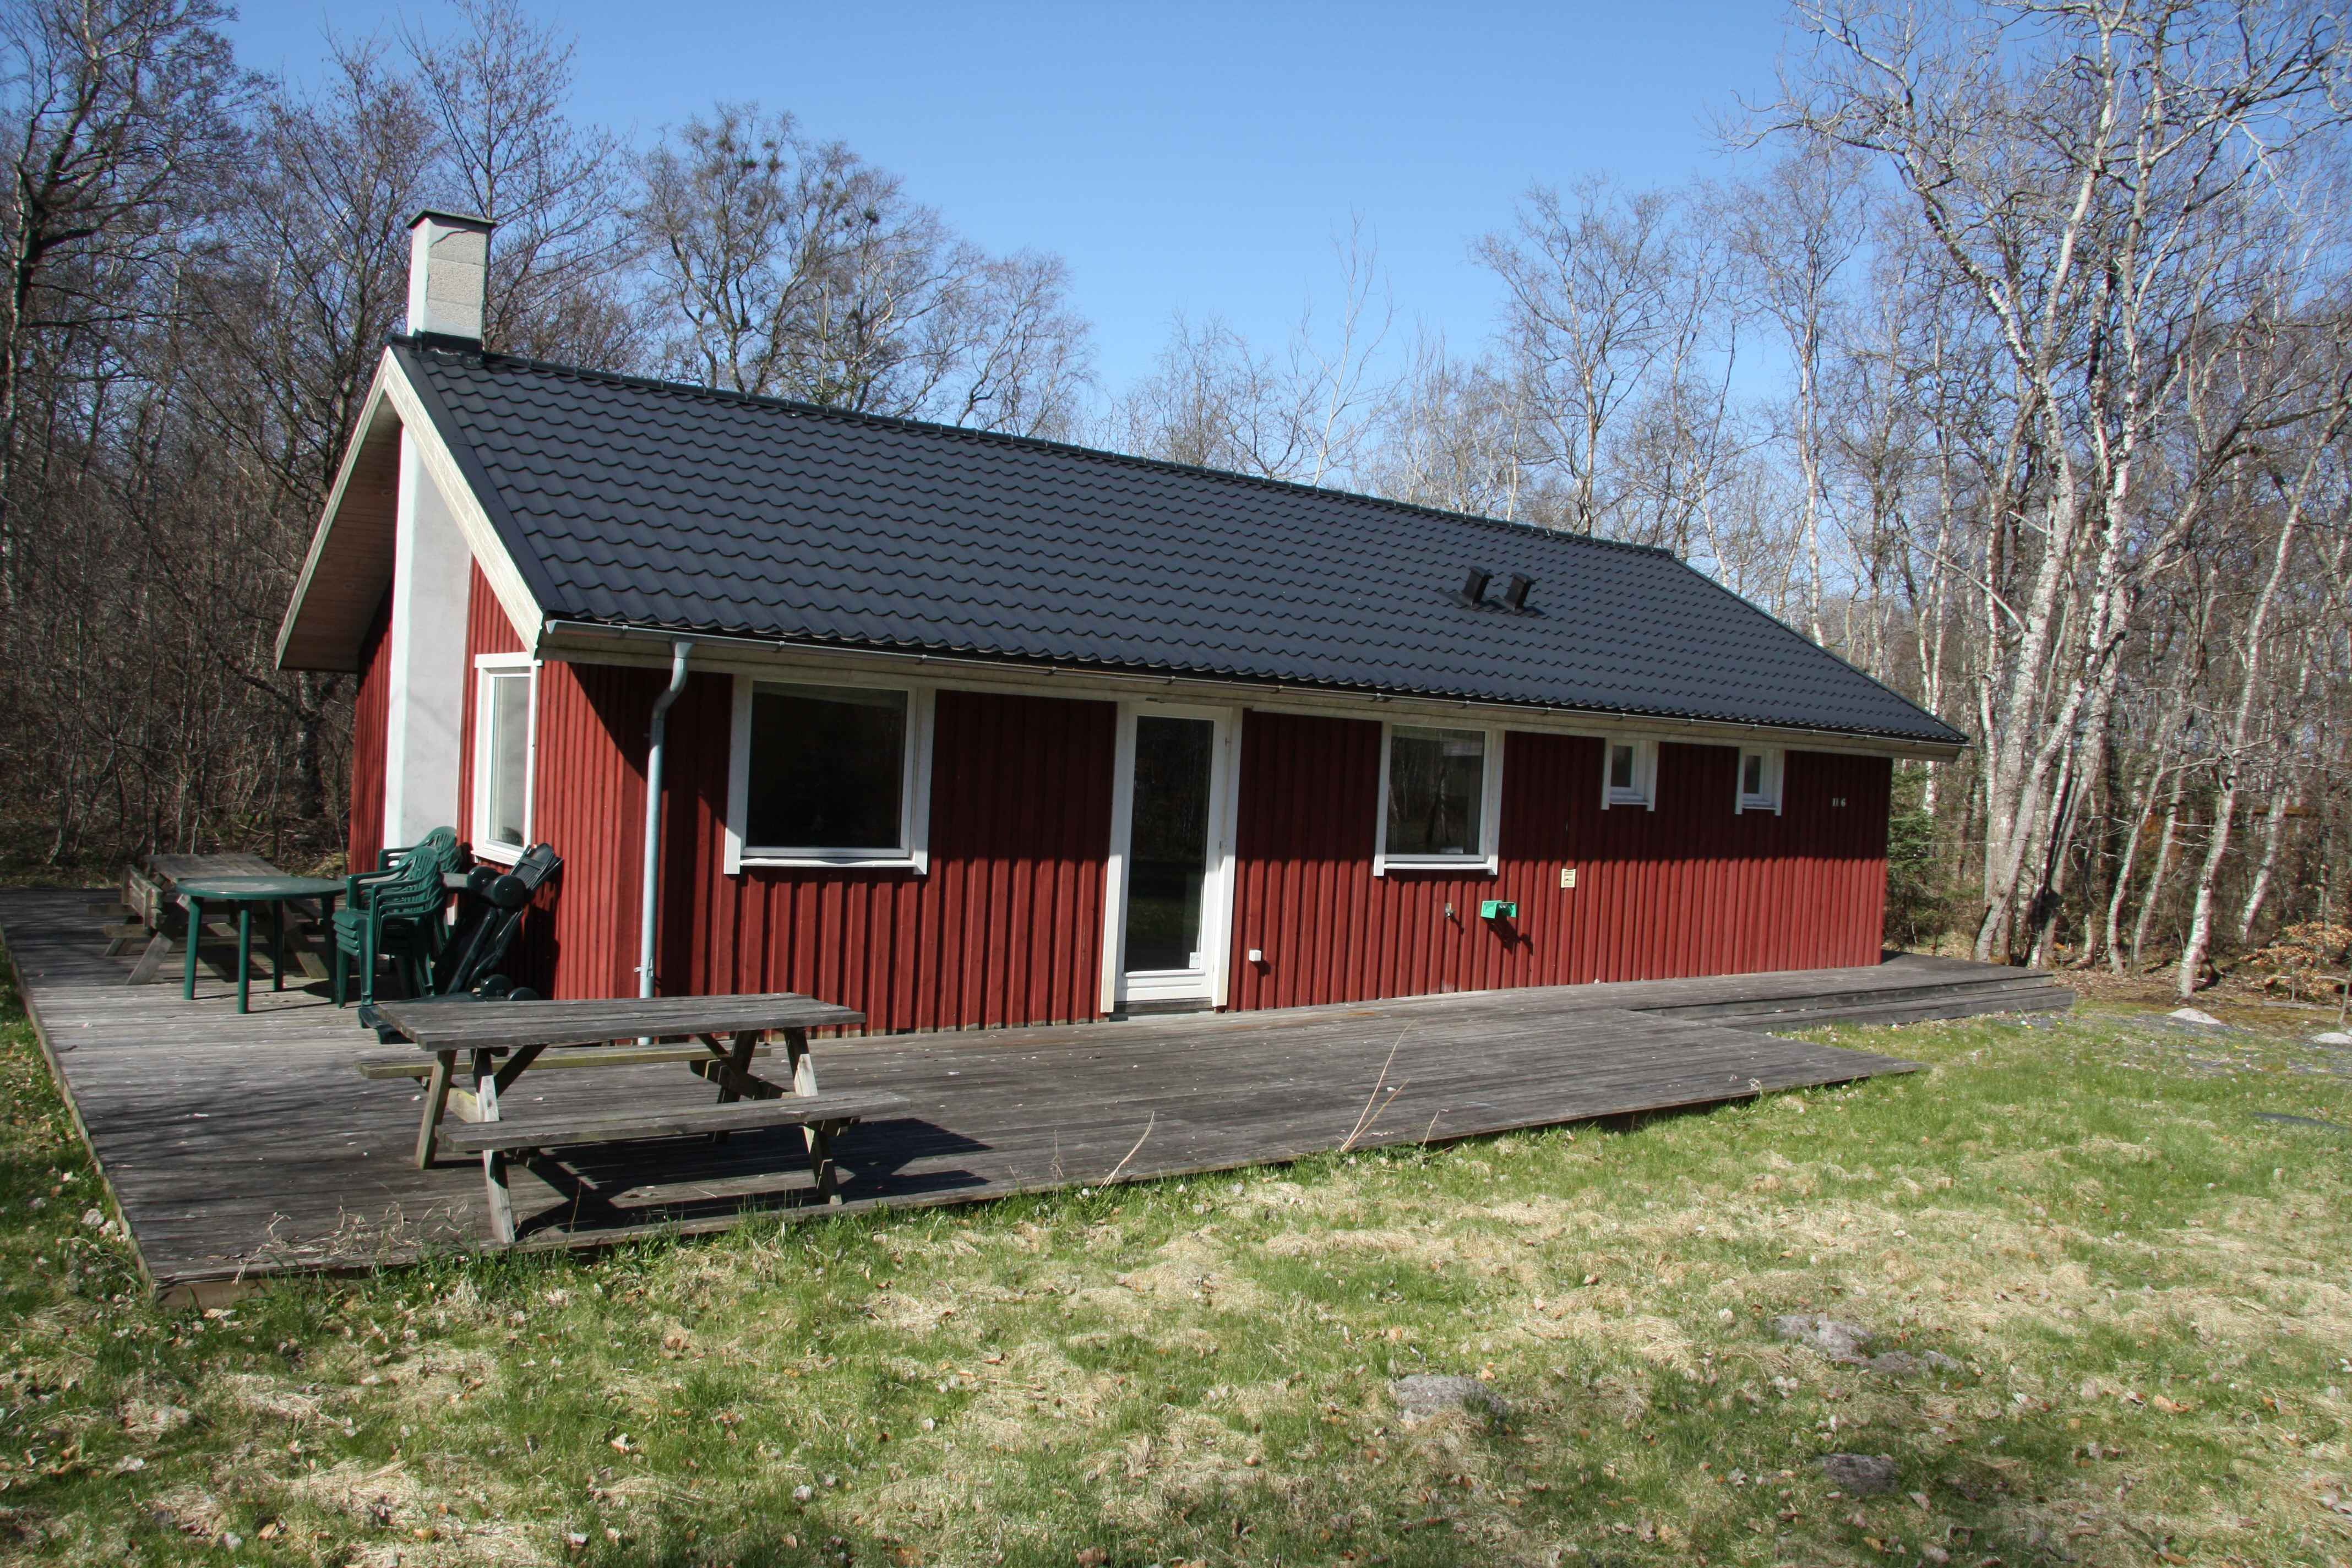 Vidjeparken 116, Helberskov, 9560 Hadsund